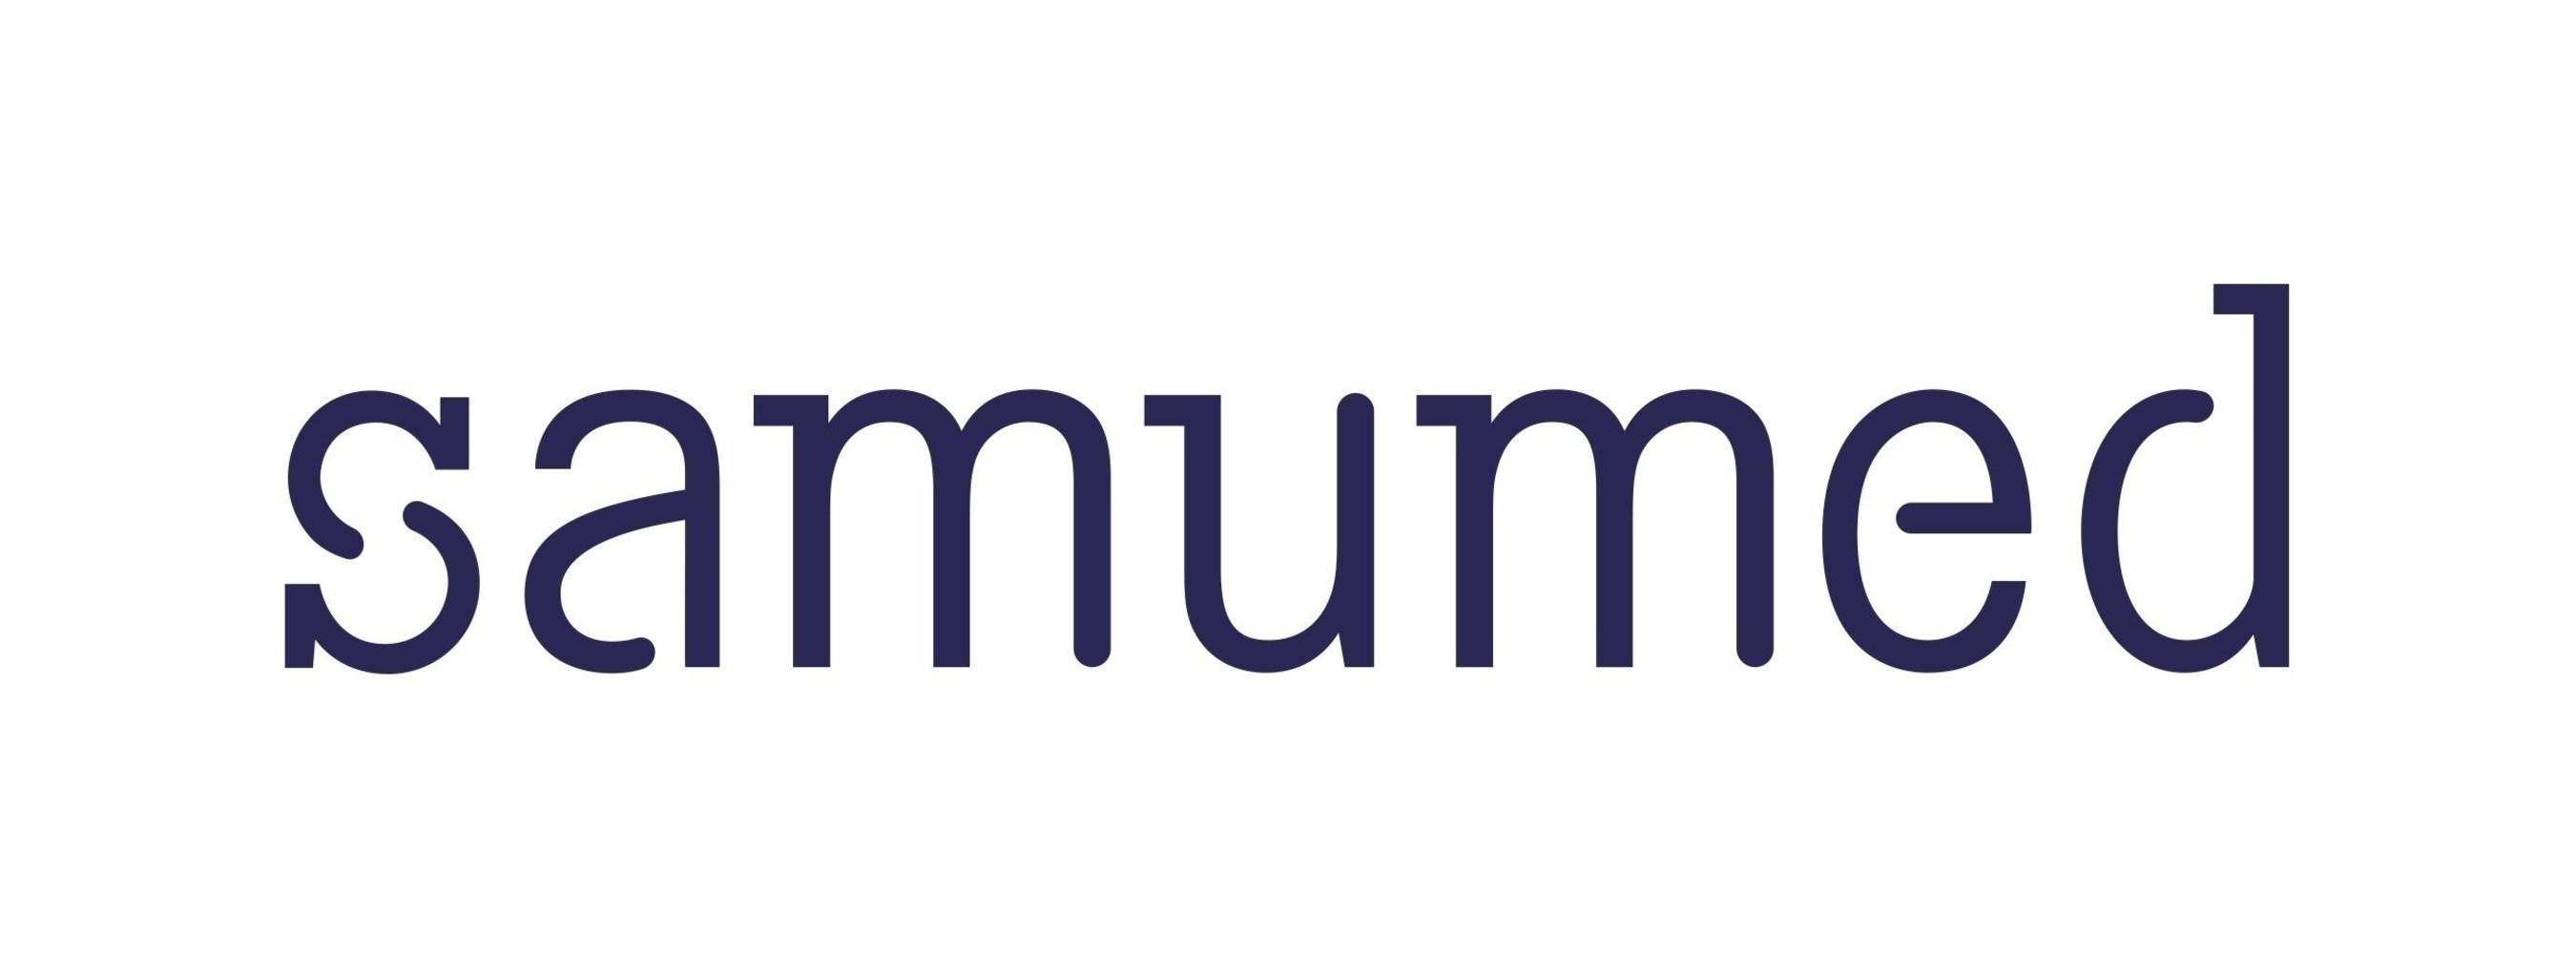 Samumed, LLC